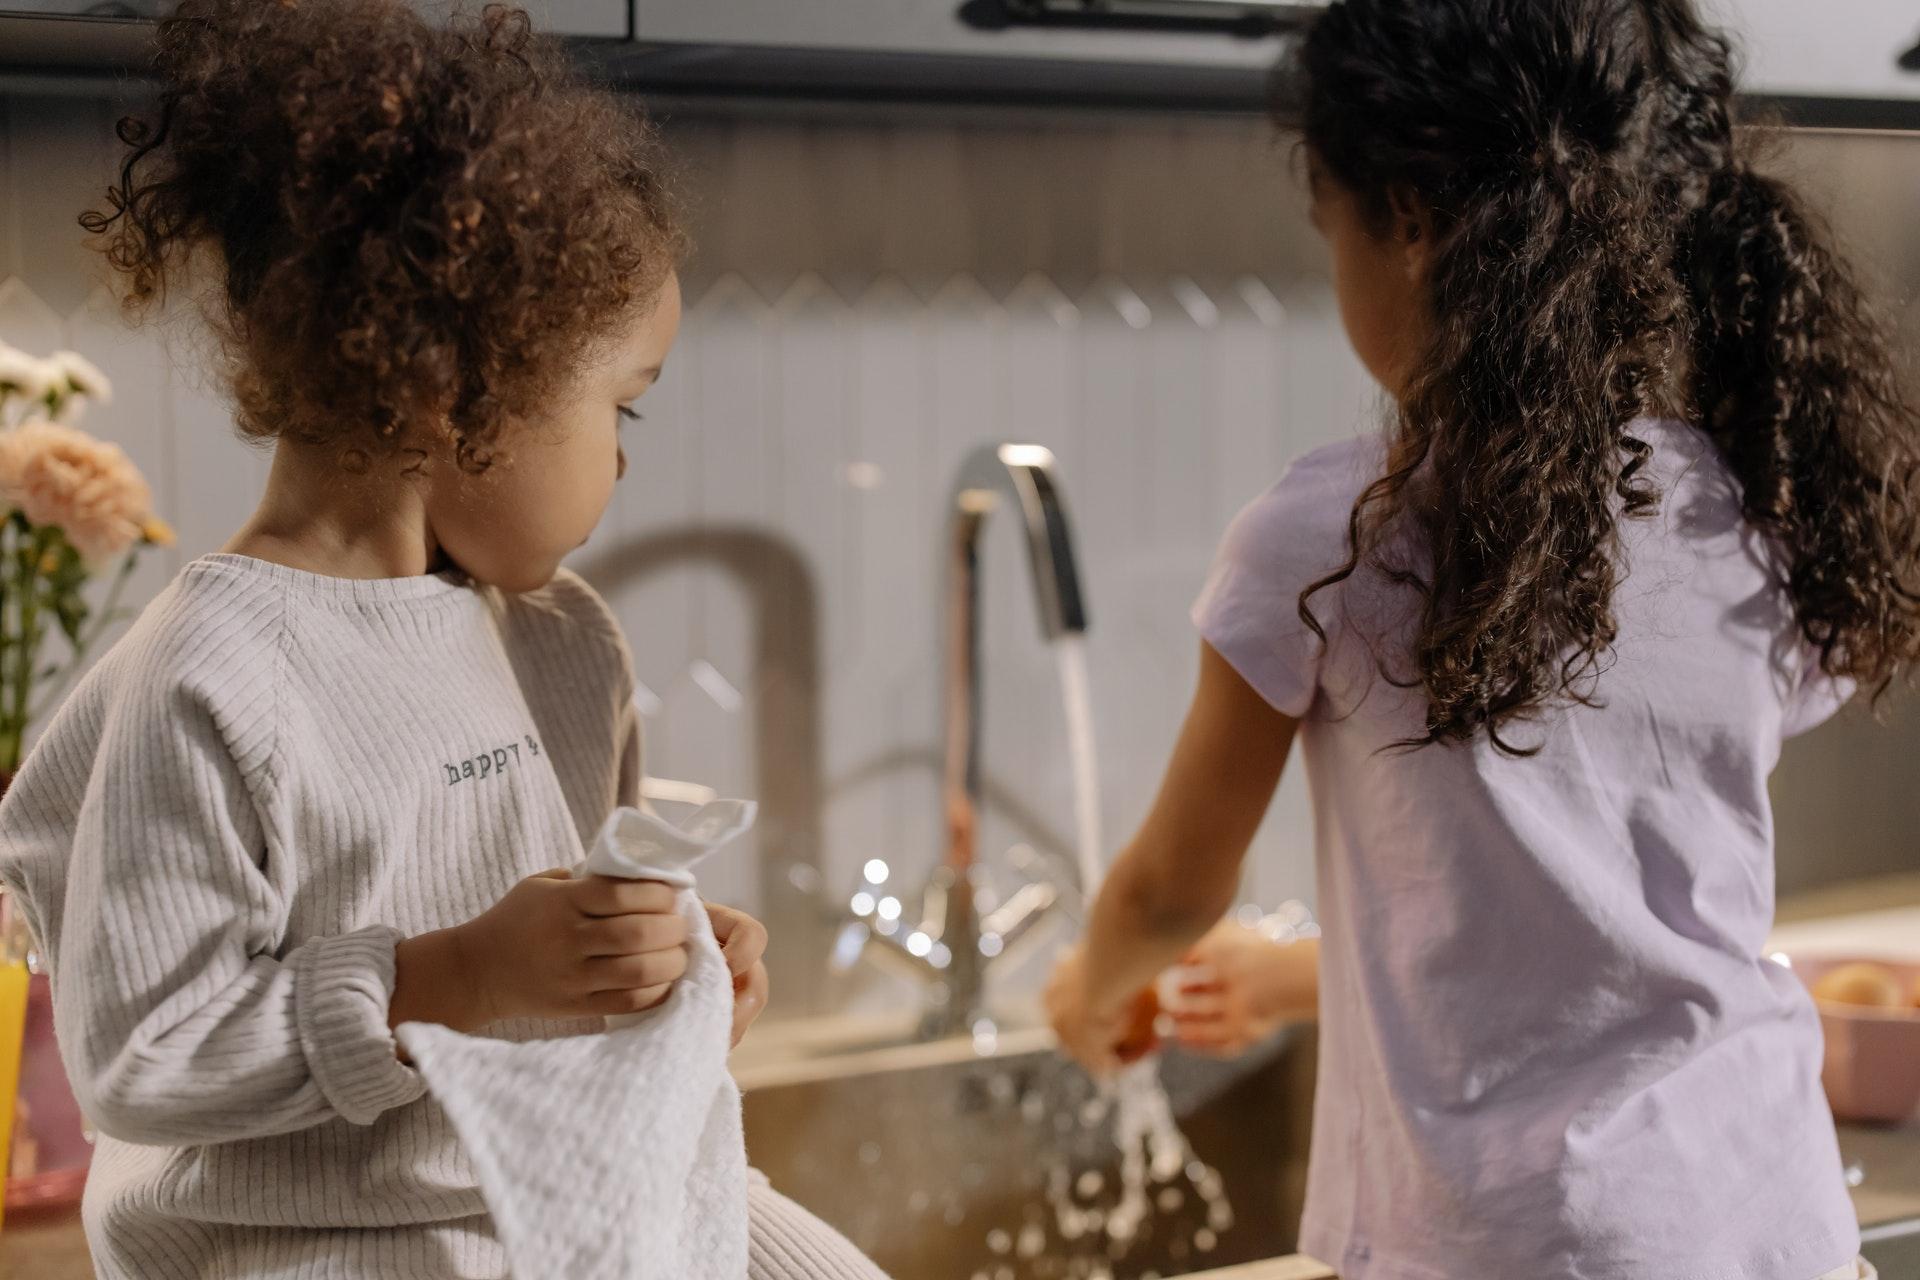 How to Make Children Do Chores Around the House